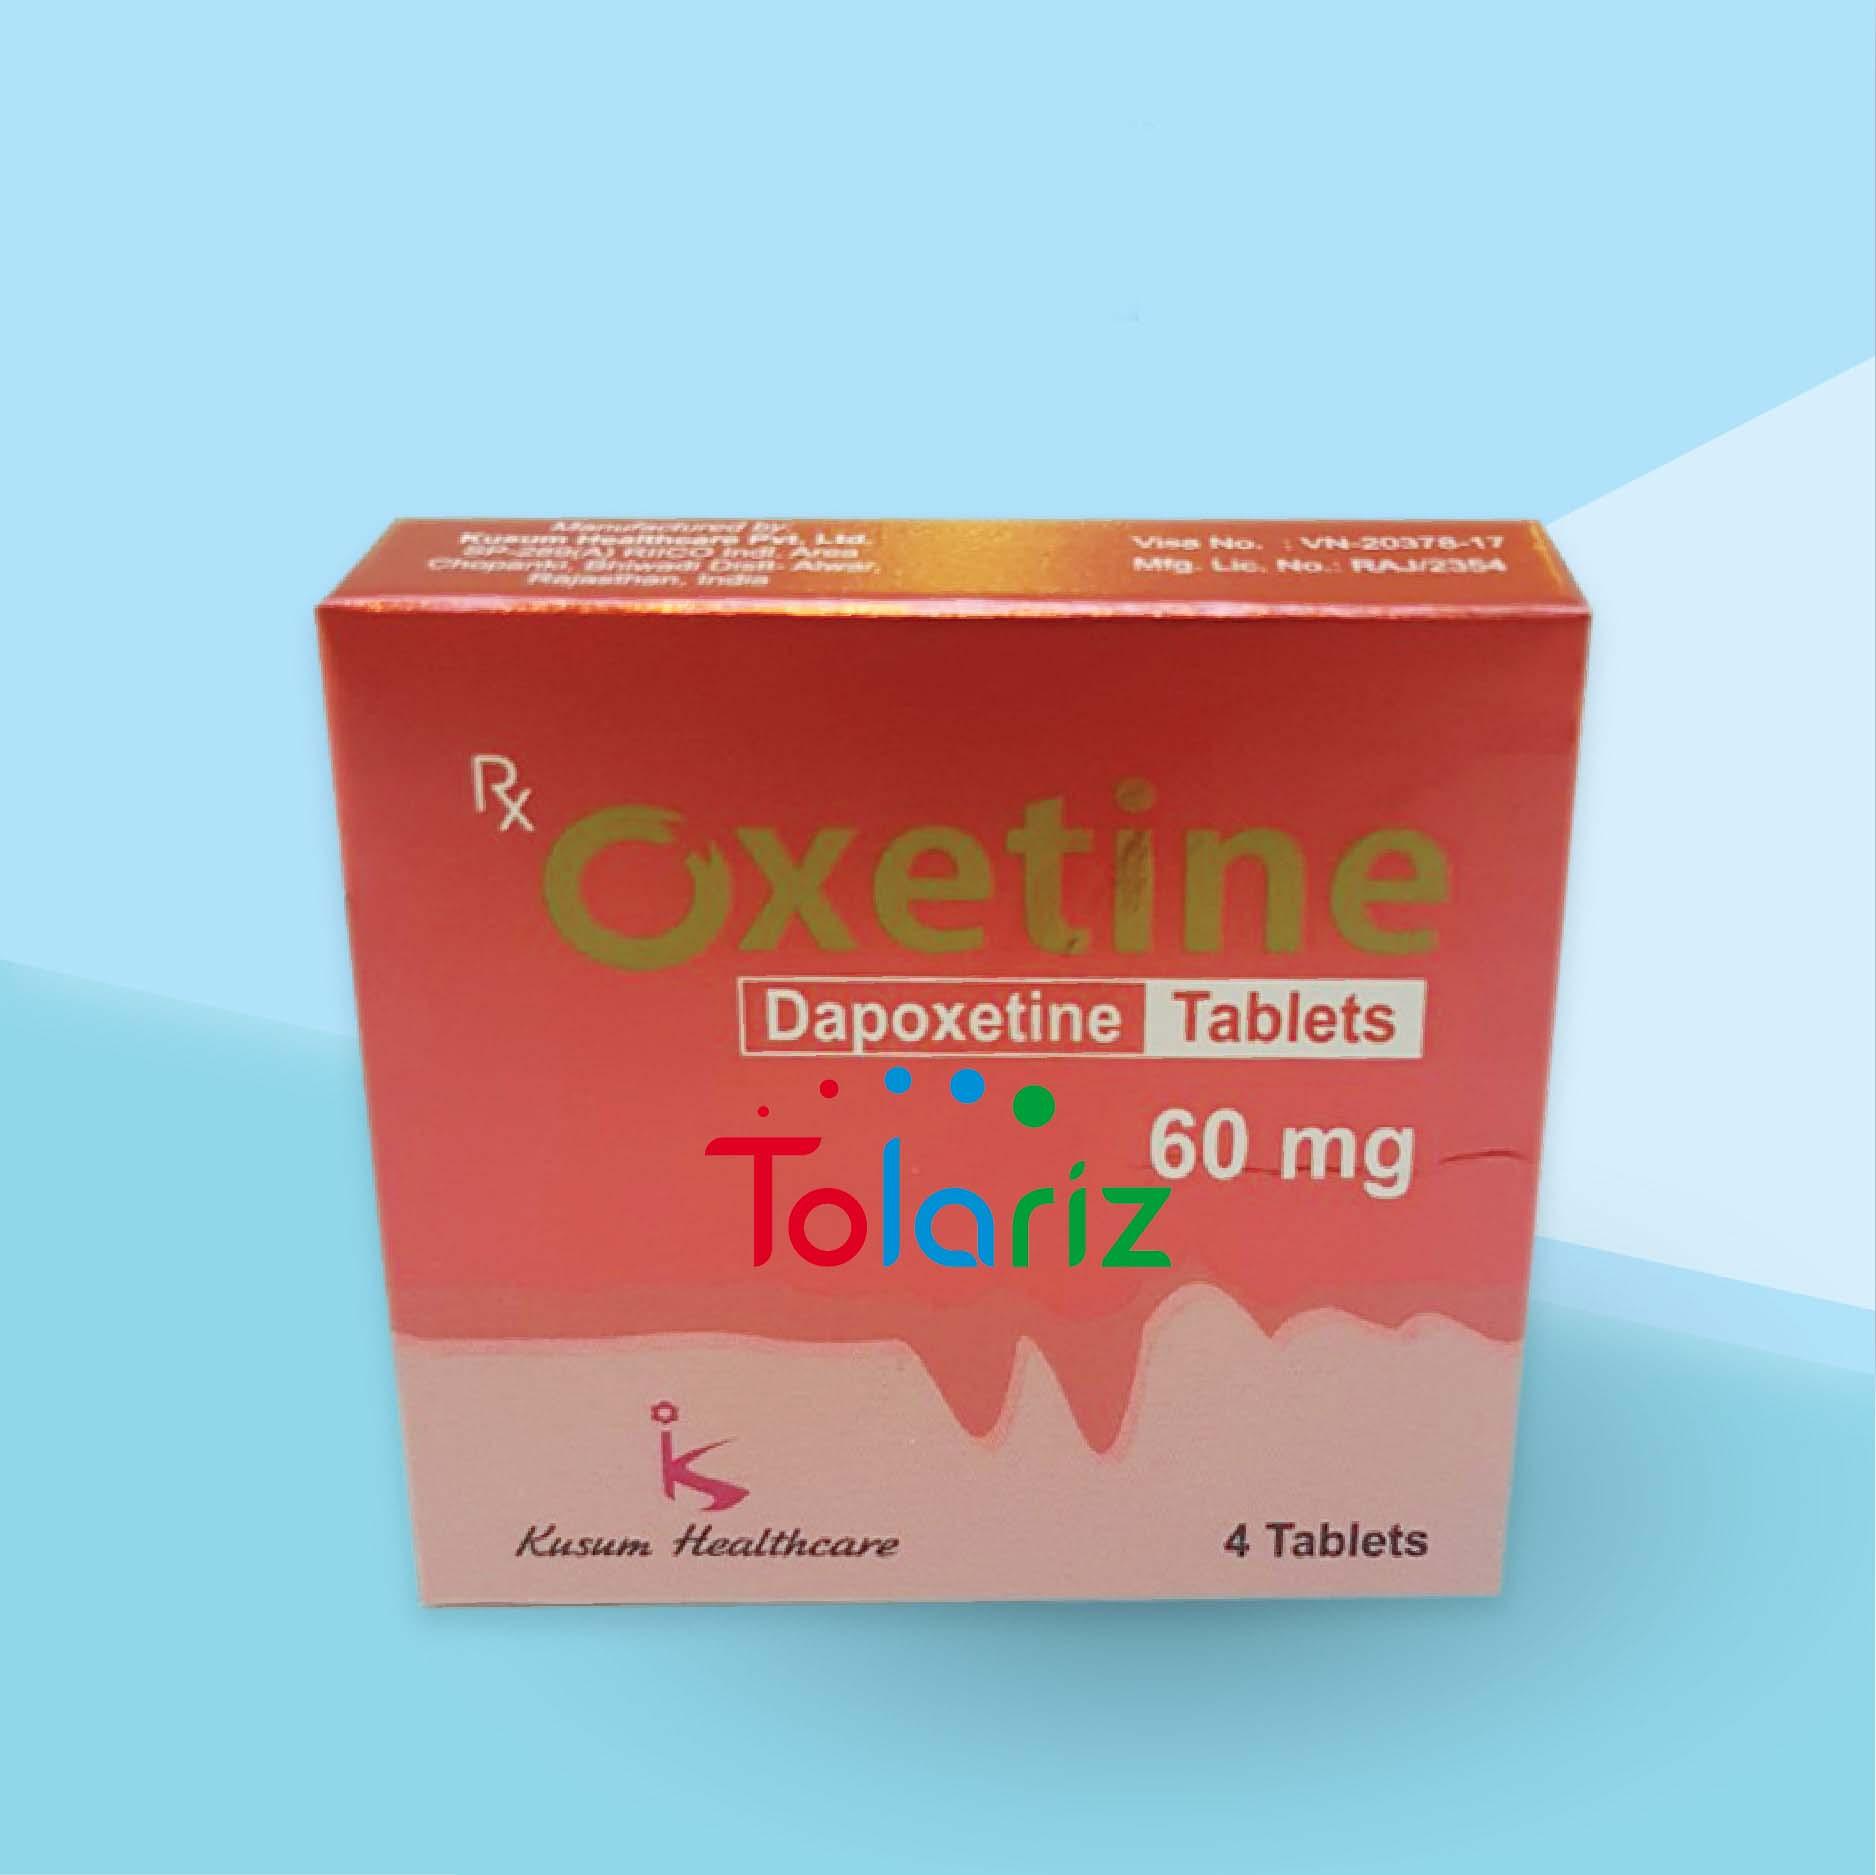 Thuốc oxetine là thuốc gì?